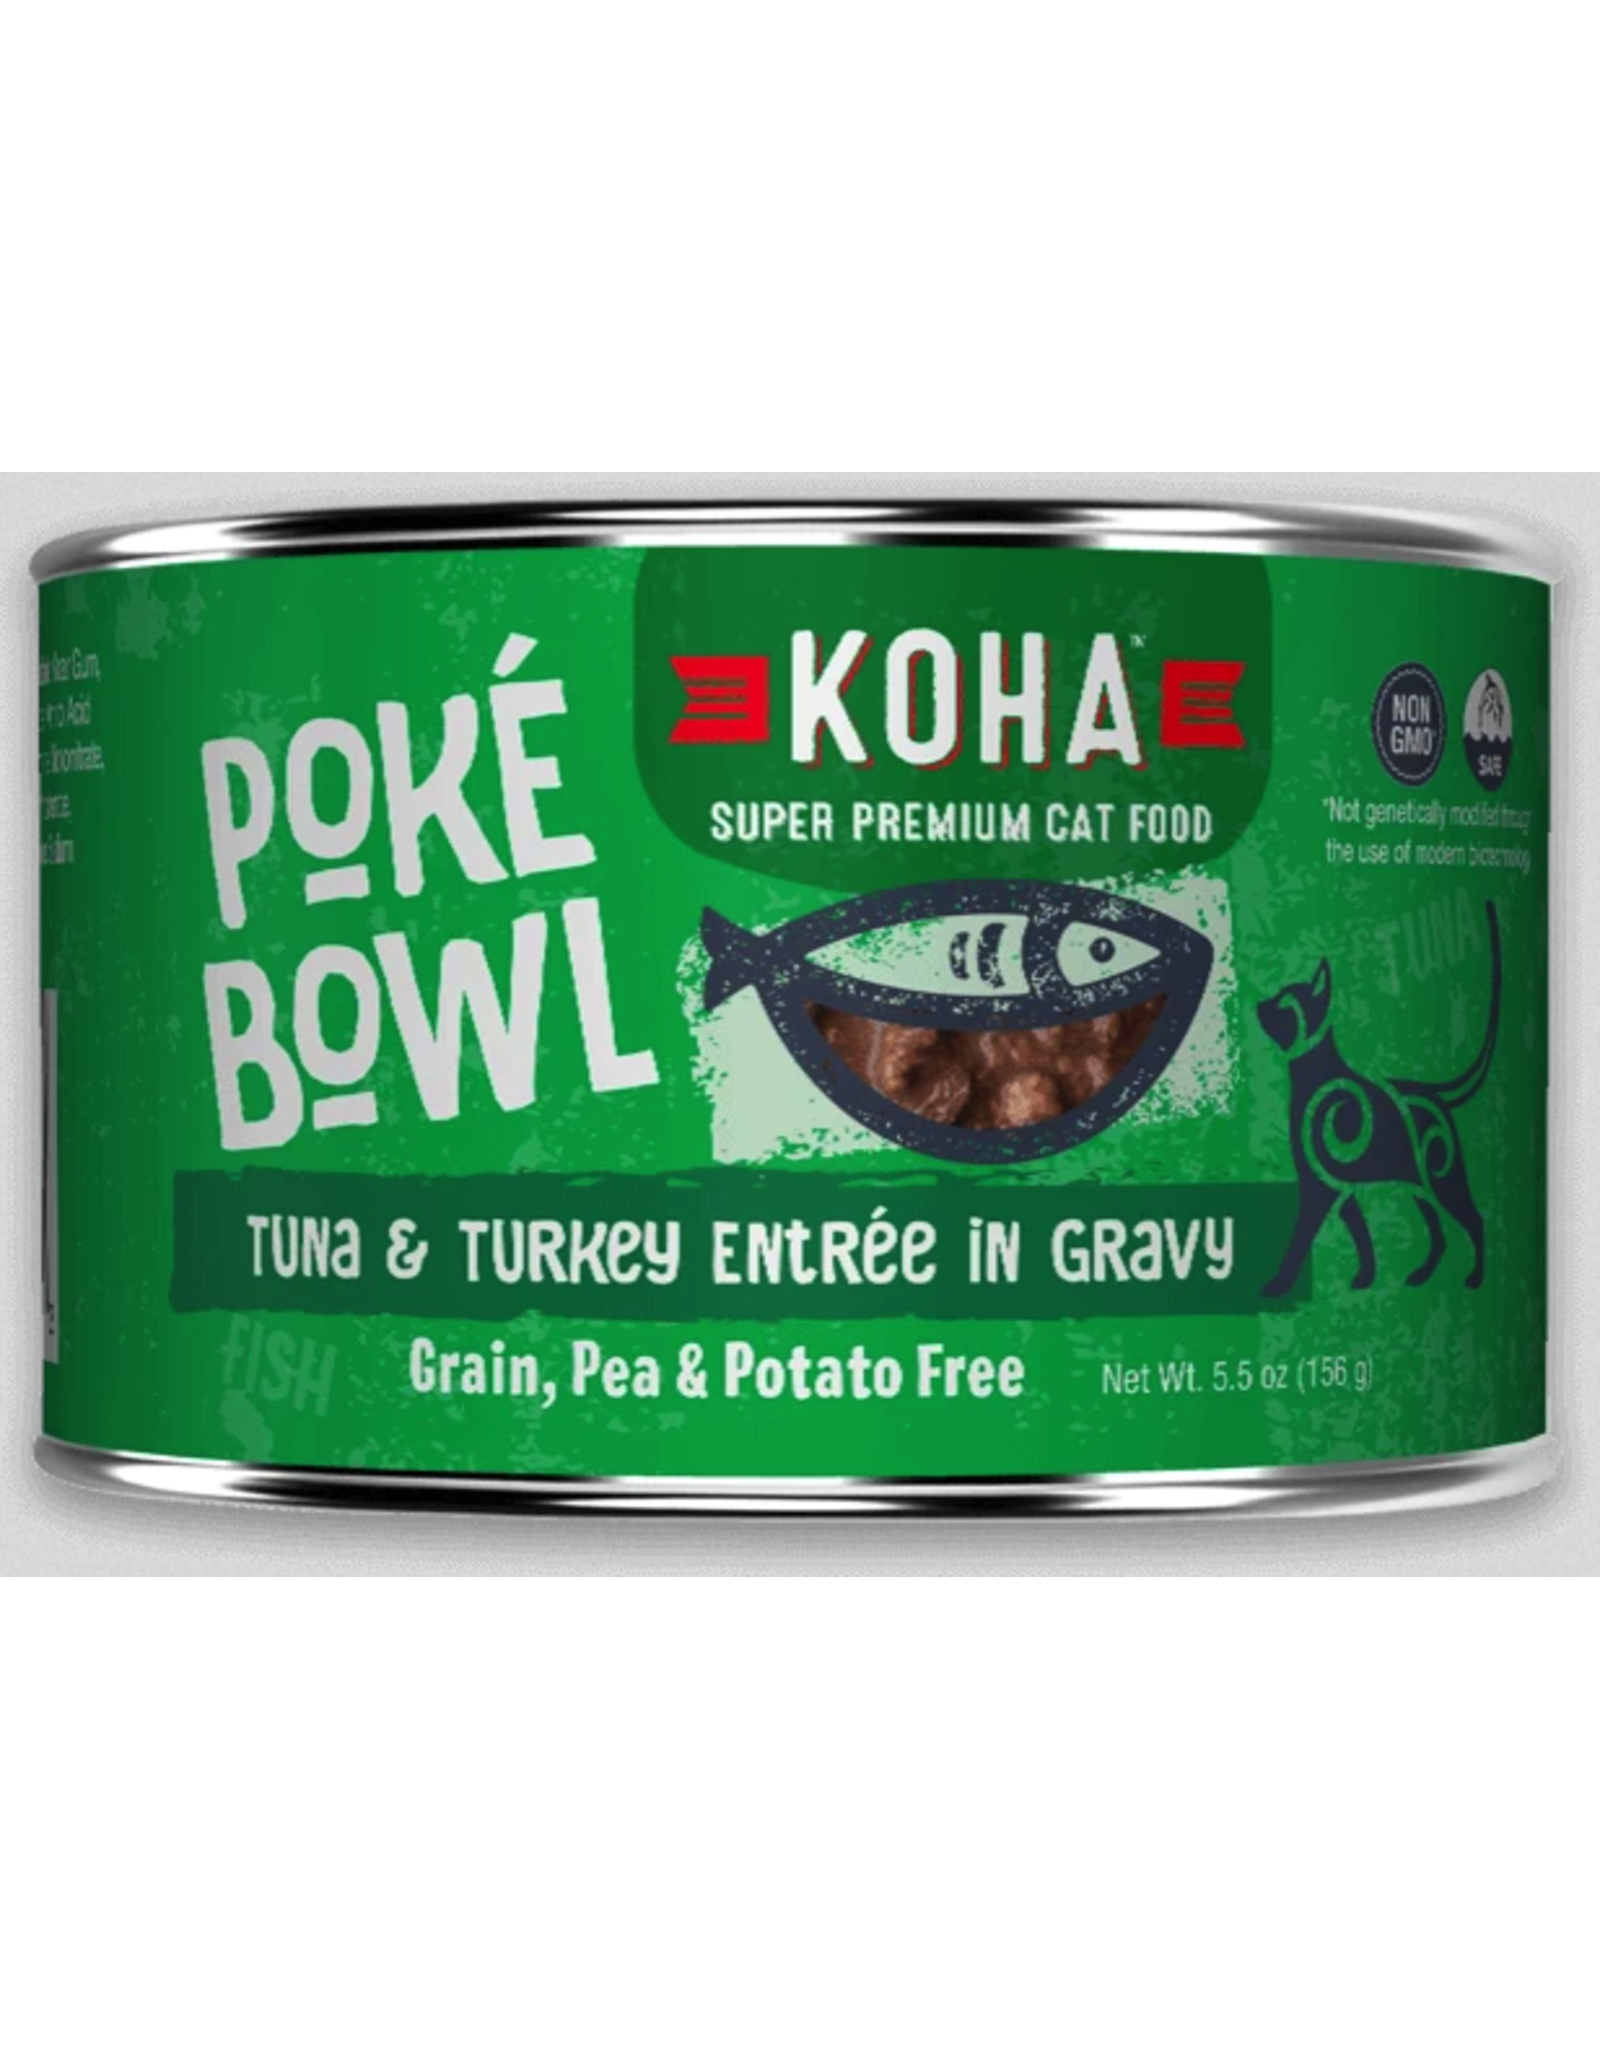 Koha Pet Koha Cat Poke Bowl Tuna Turkey Can 5.5oz